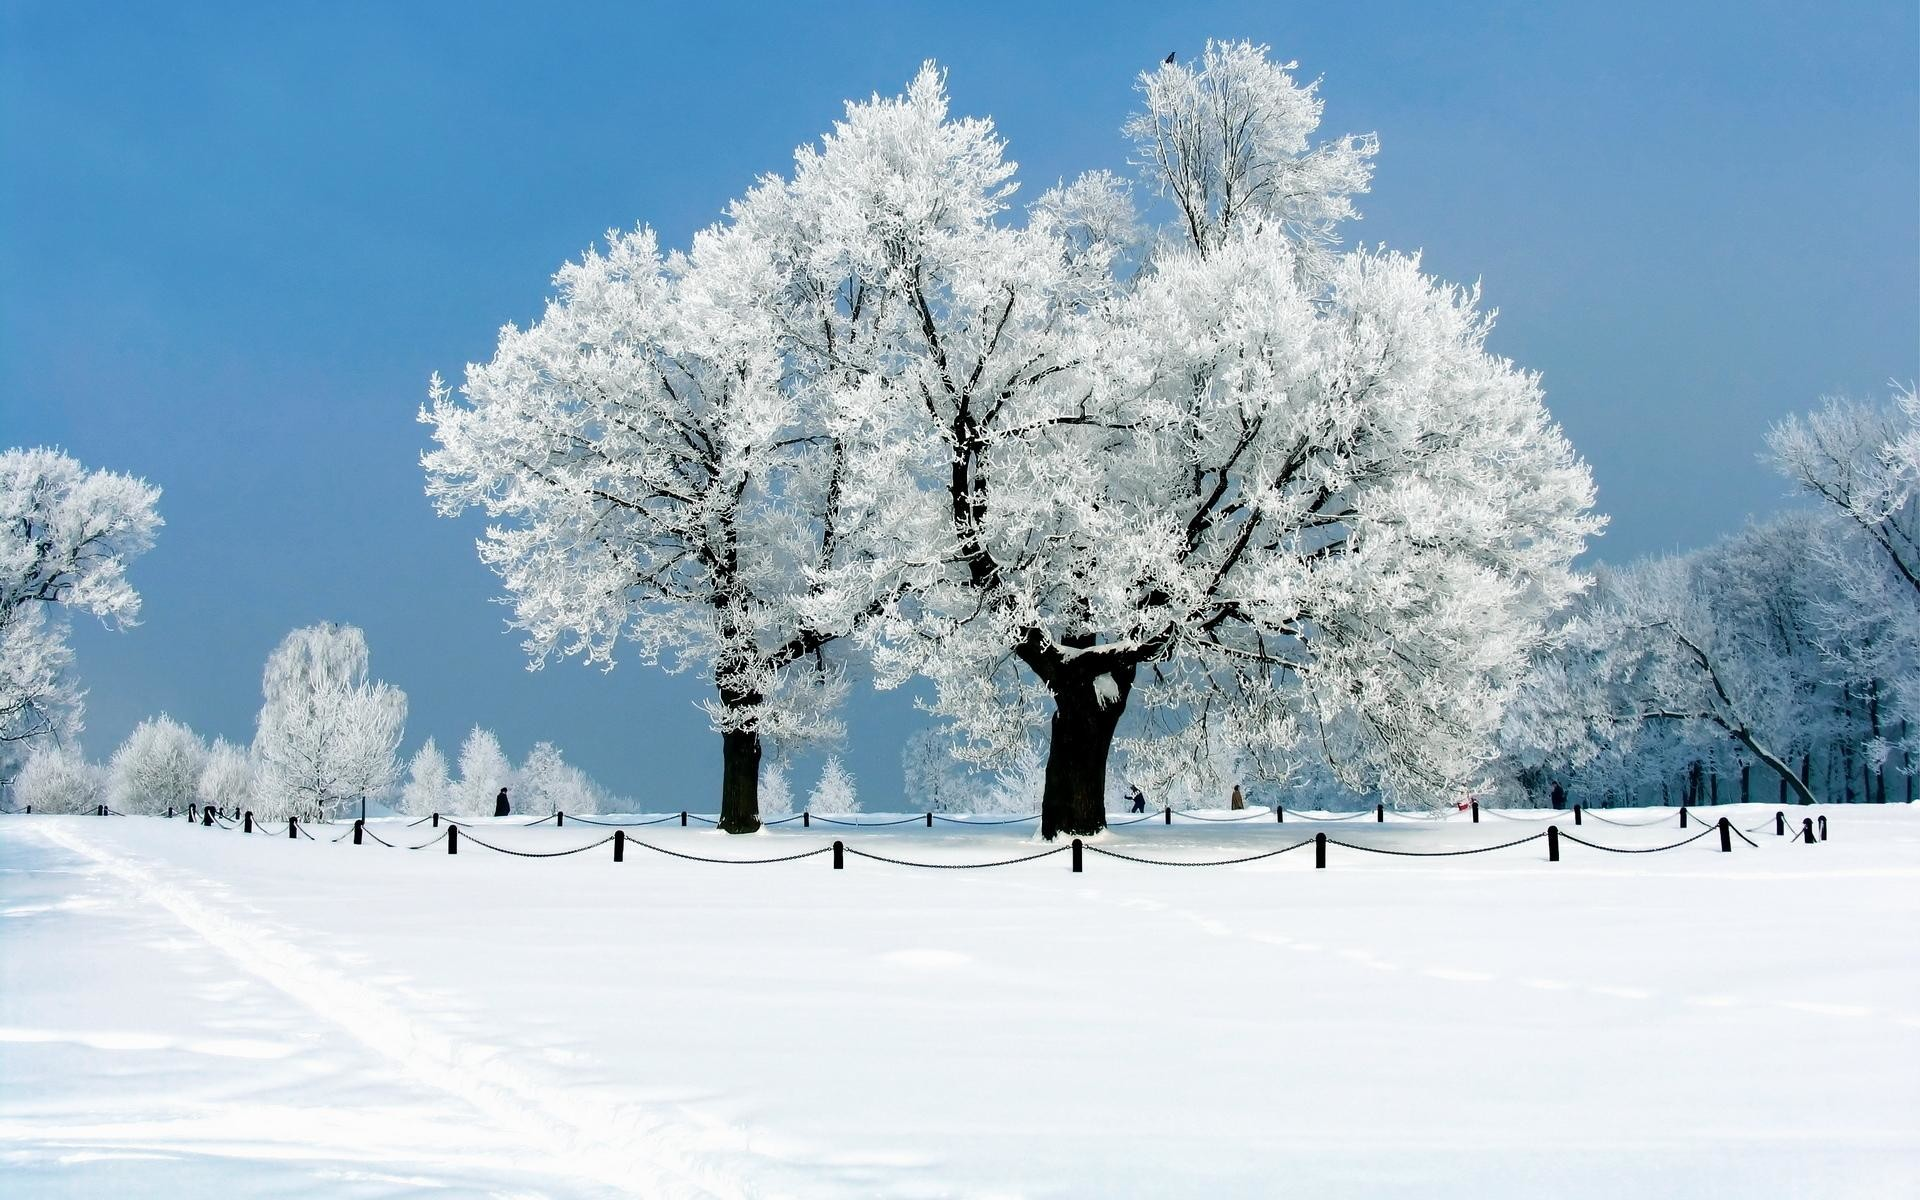 wallpaper.wiki-Snow-Desktop-Backgrounds-PIC-WPB0076